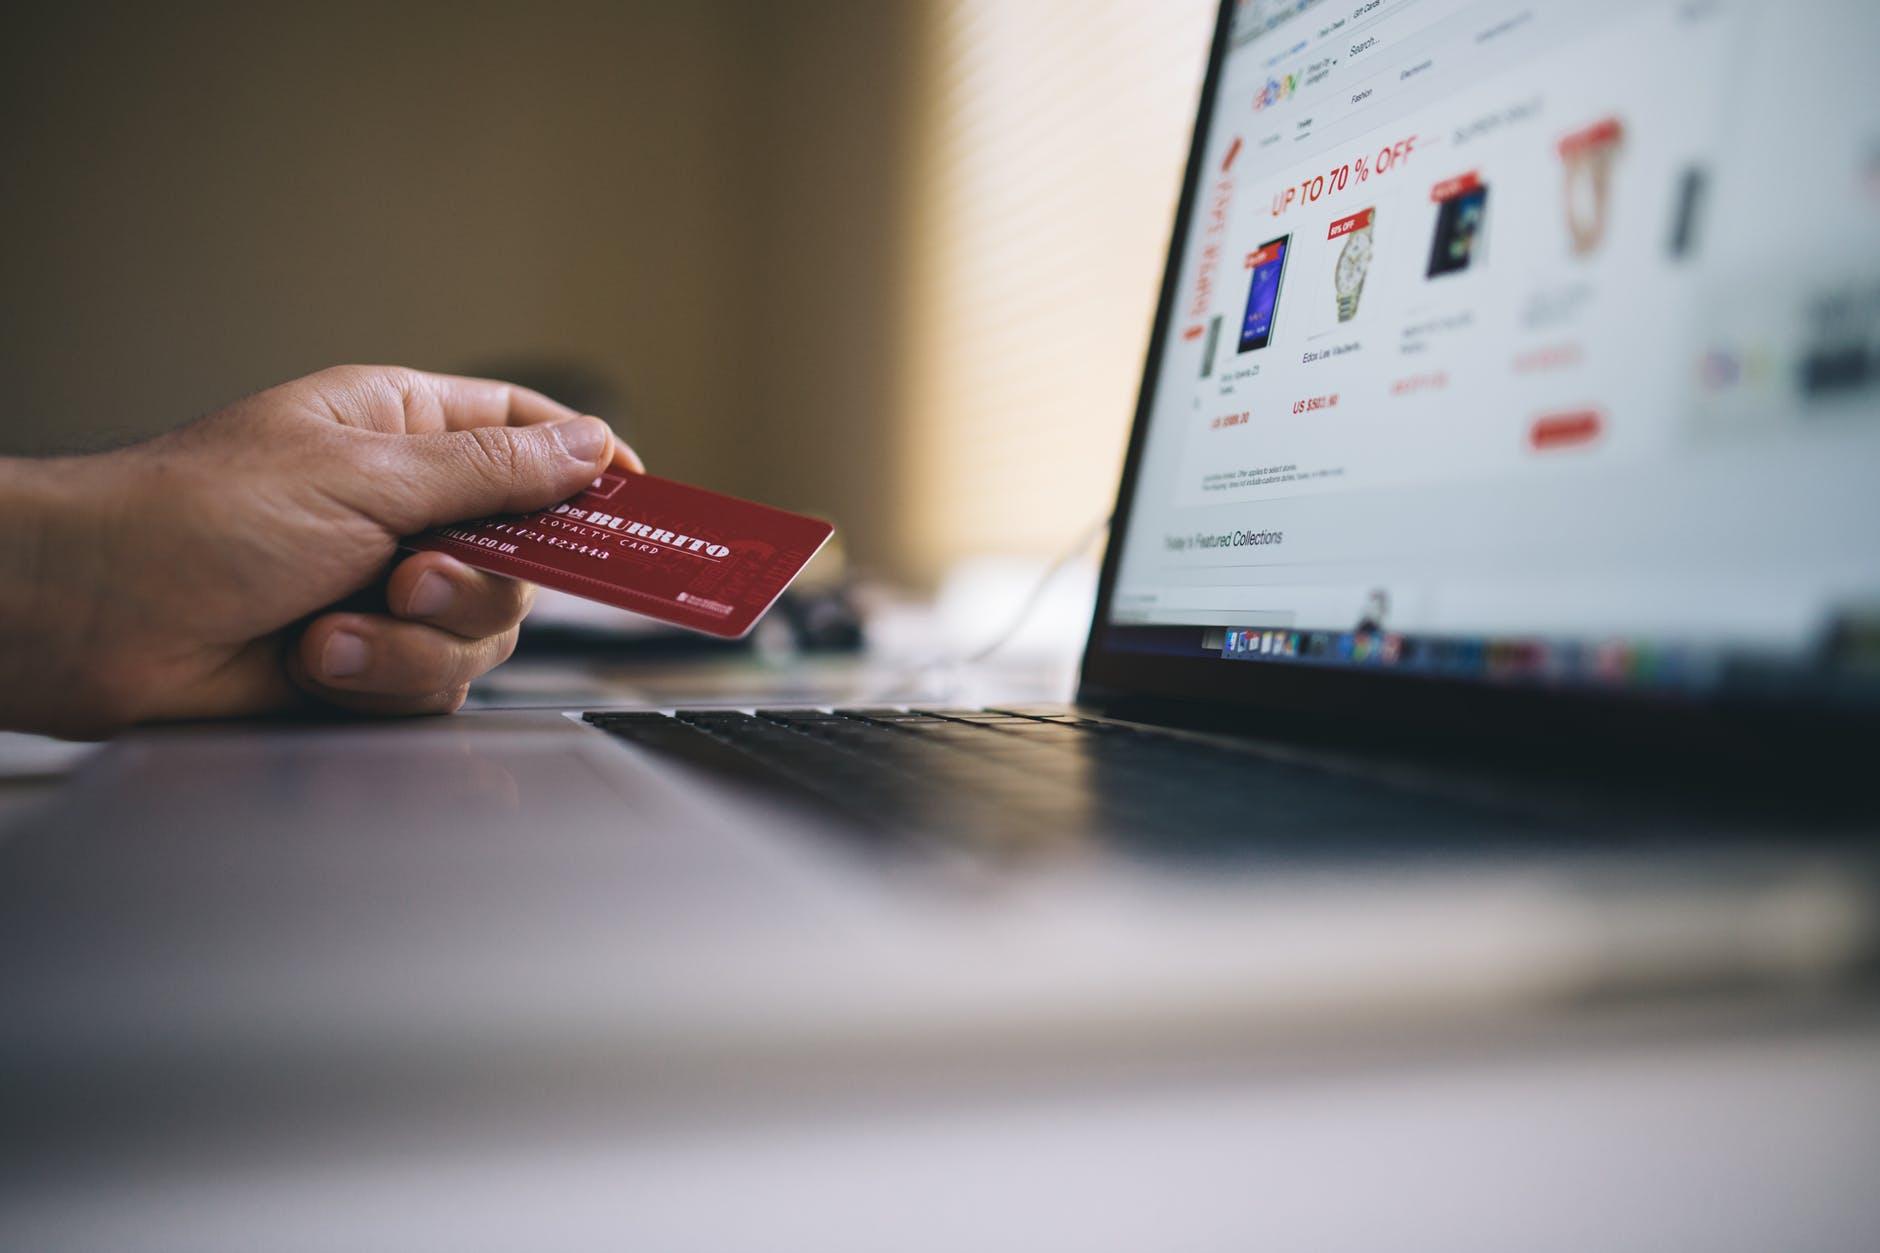 5 Situs Pasang Iklan Gratis Untuk Bisnis Online